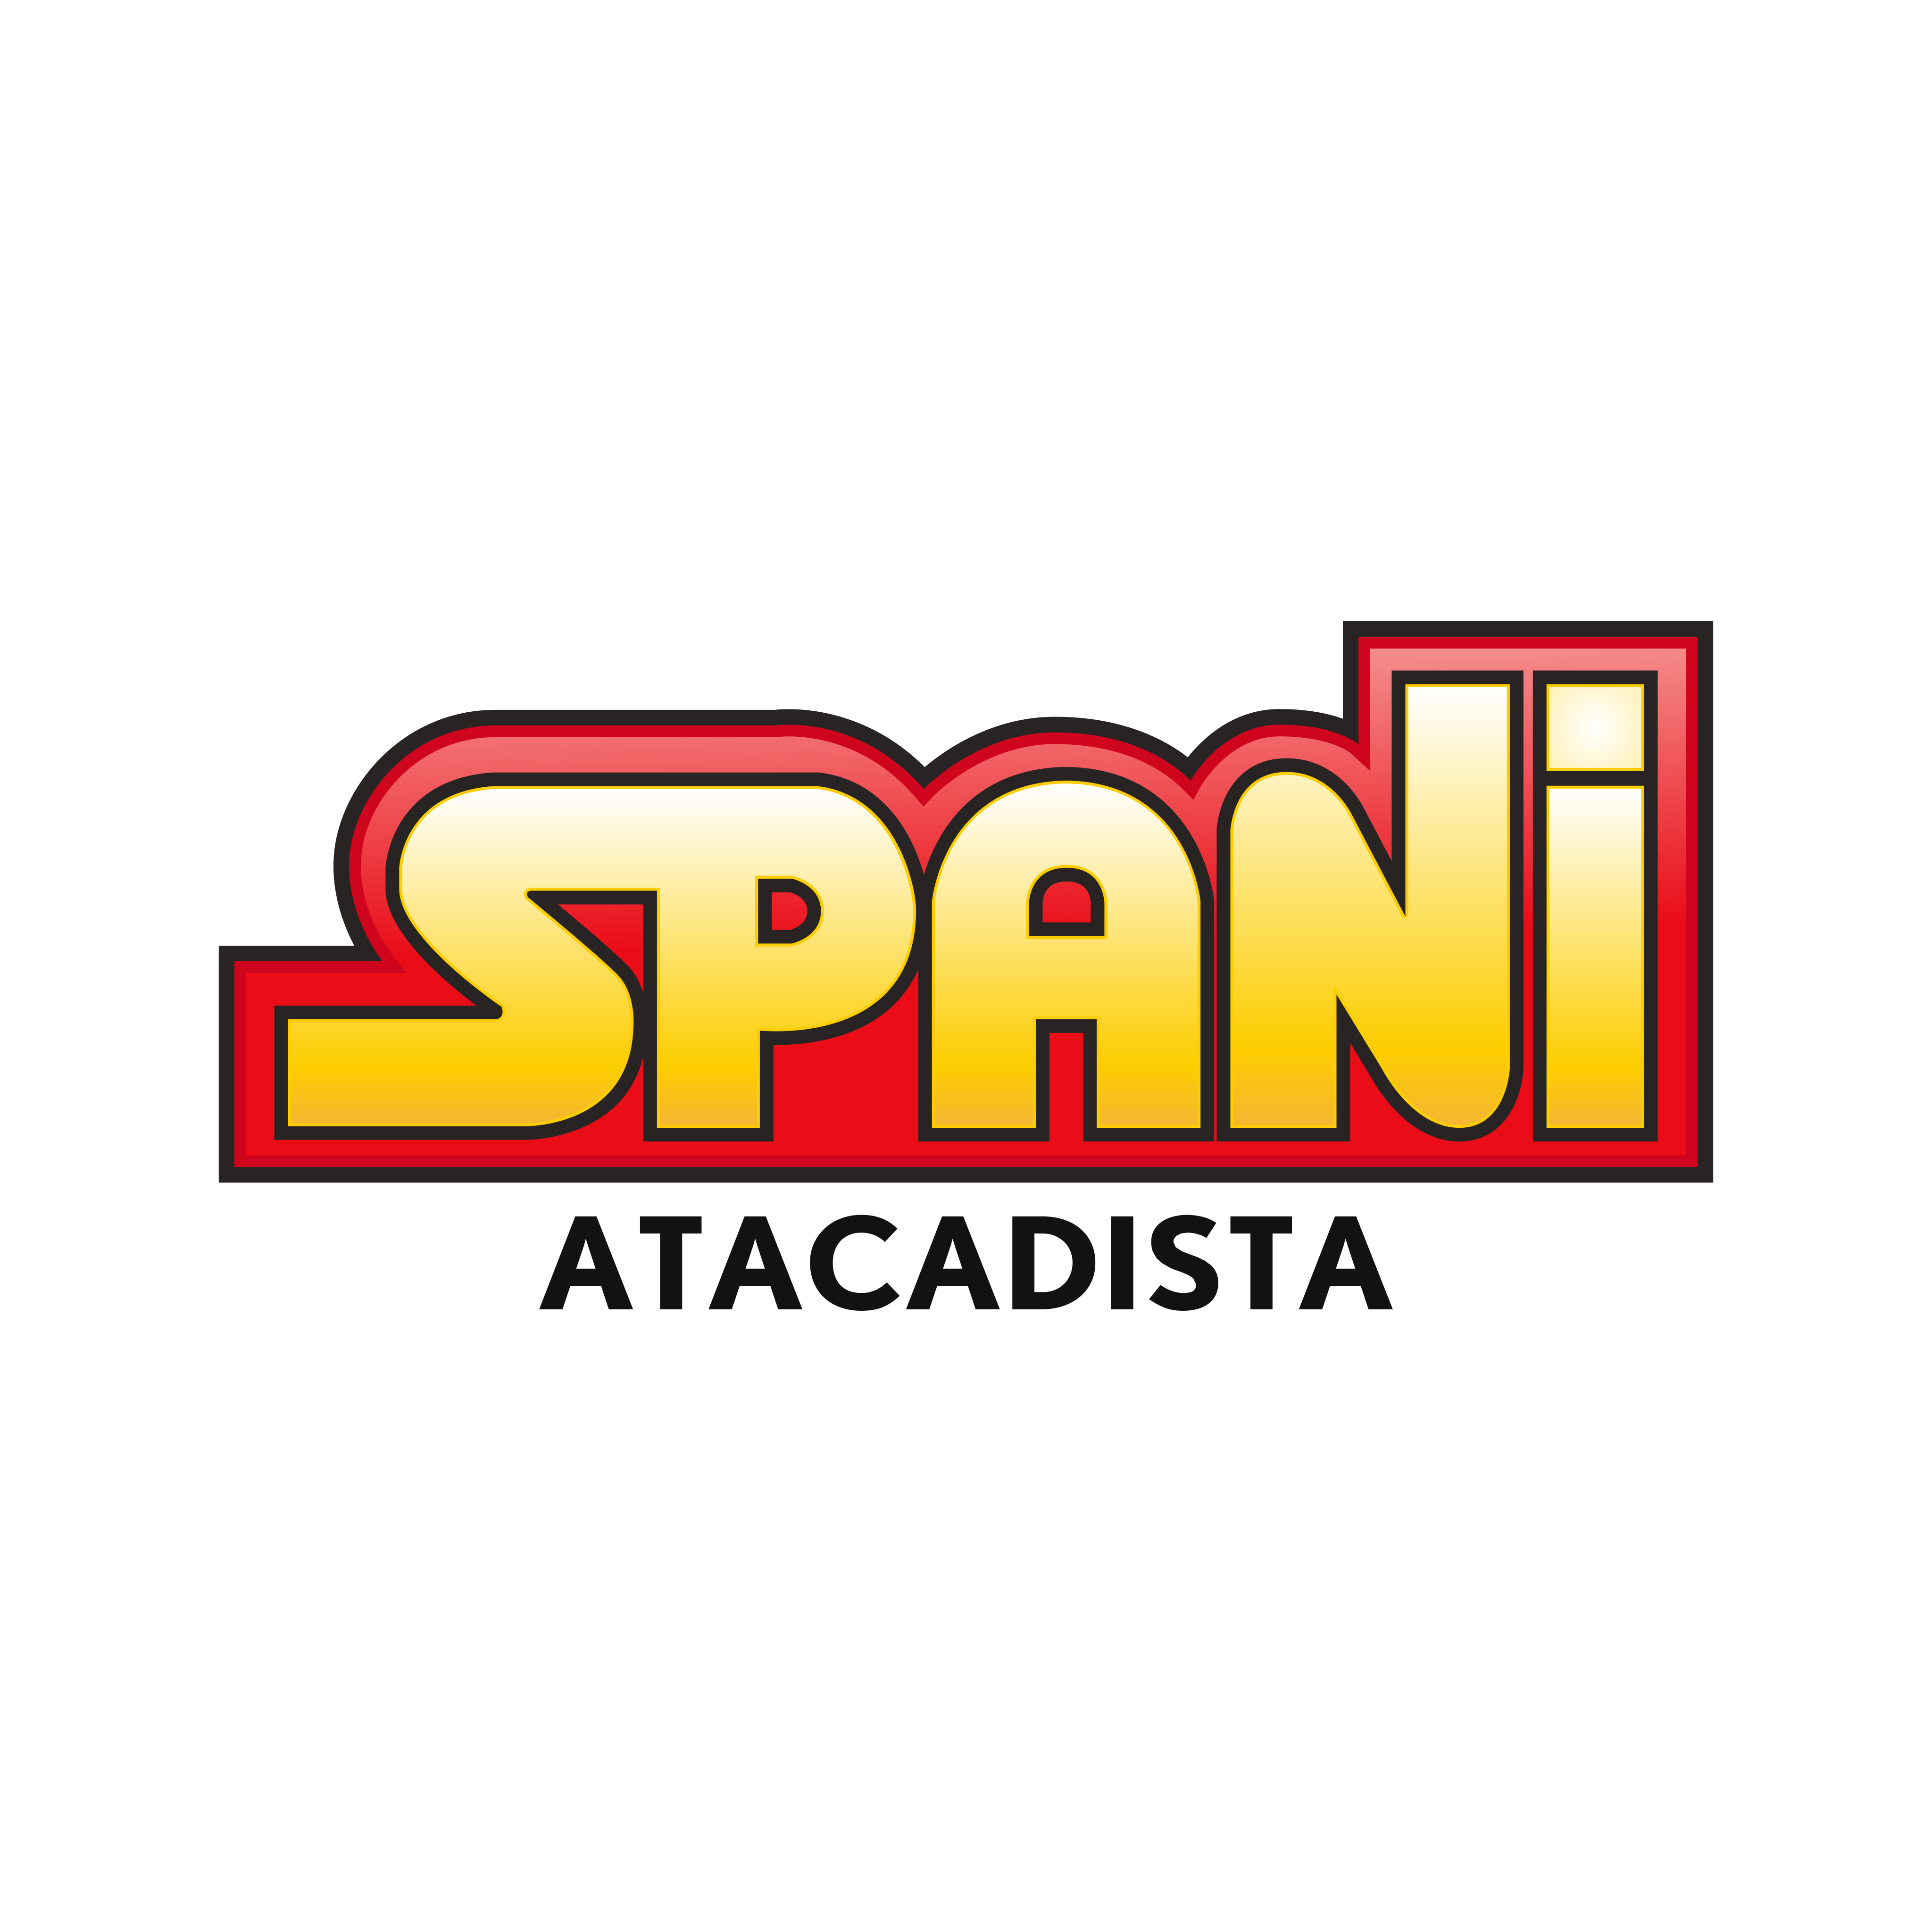 spani atacadista logo 0 - Spani Atacadista Logo